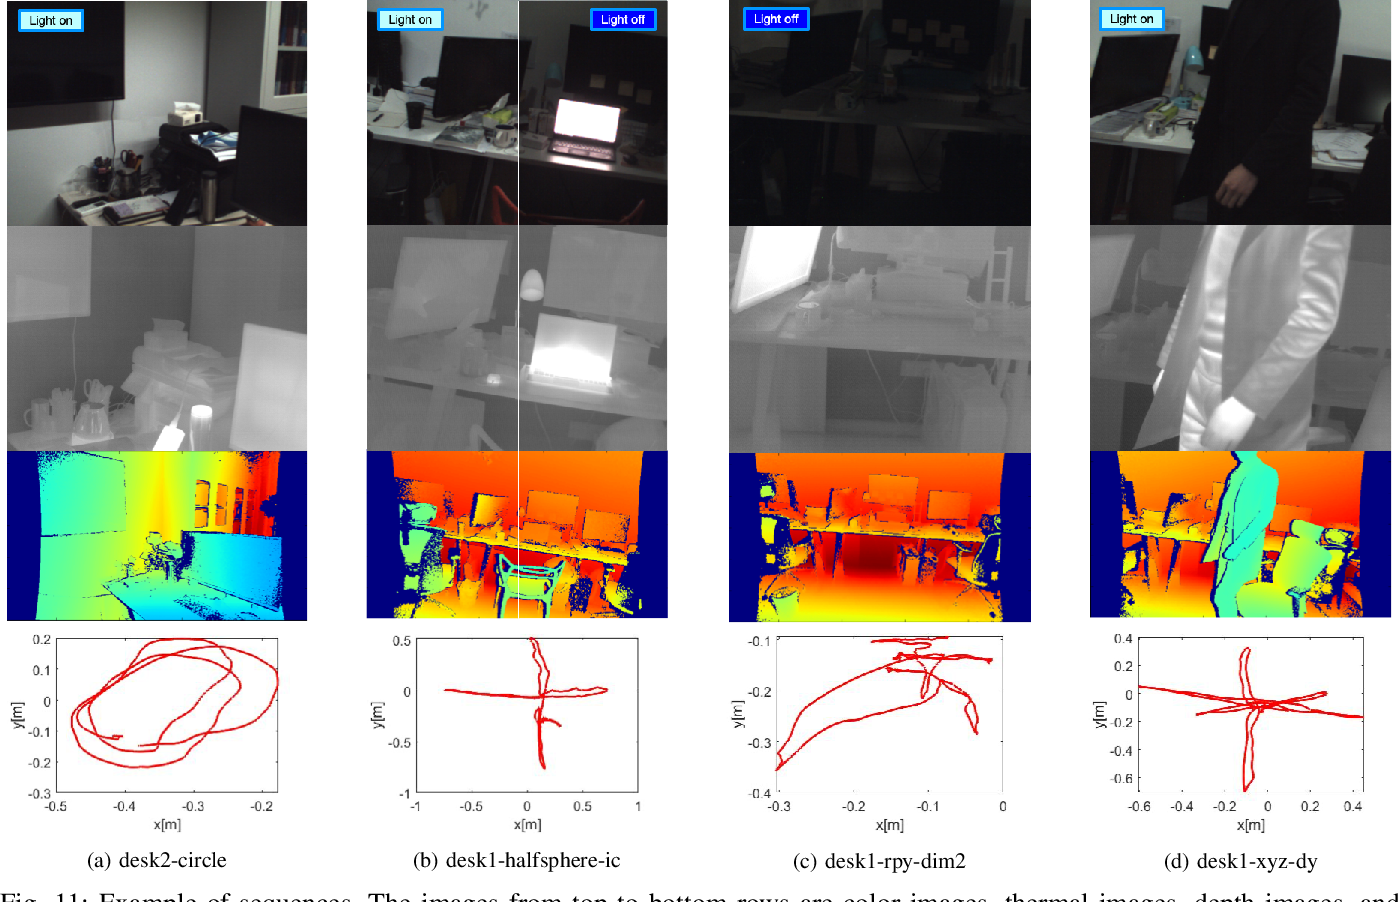 Figure 3 for A Dataset for Evaluating Multi-spectral Motion Estimation Methods